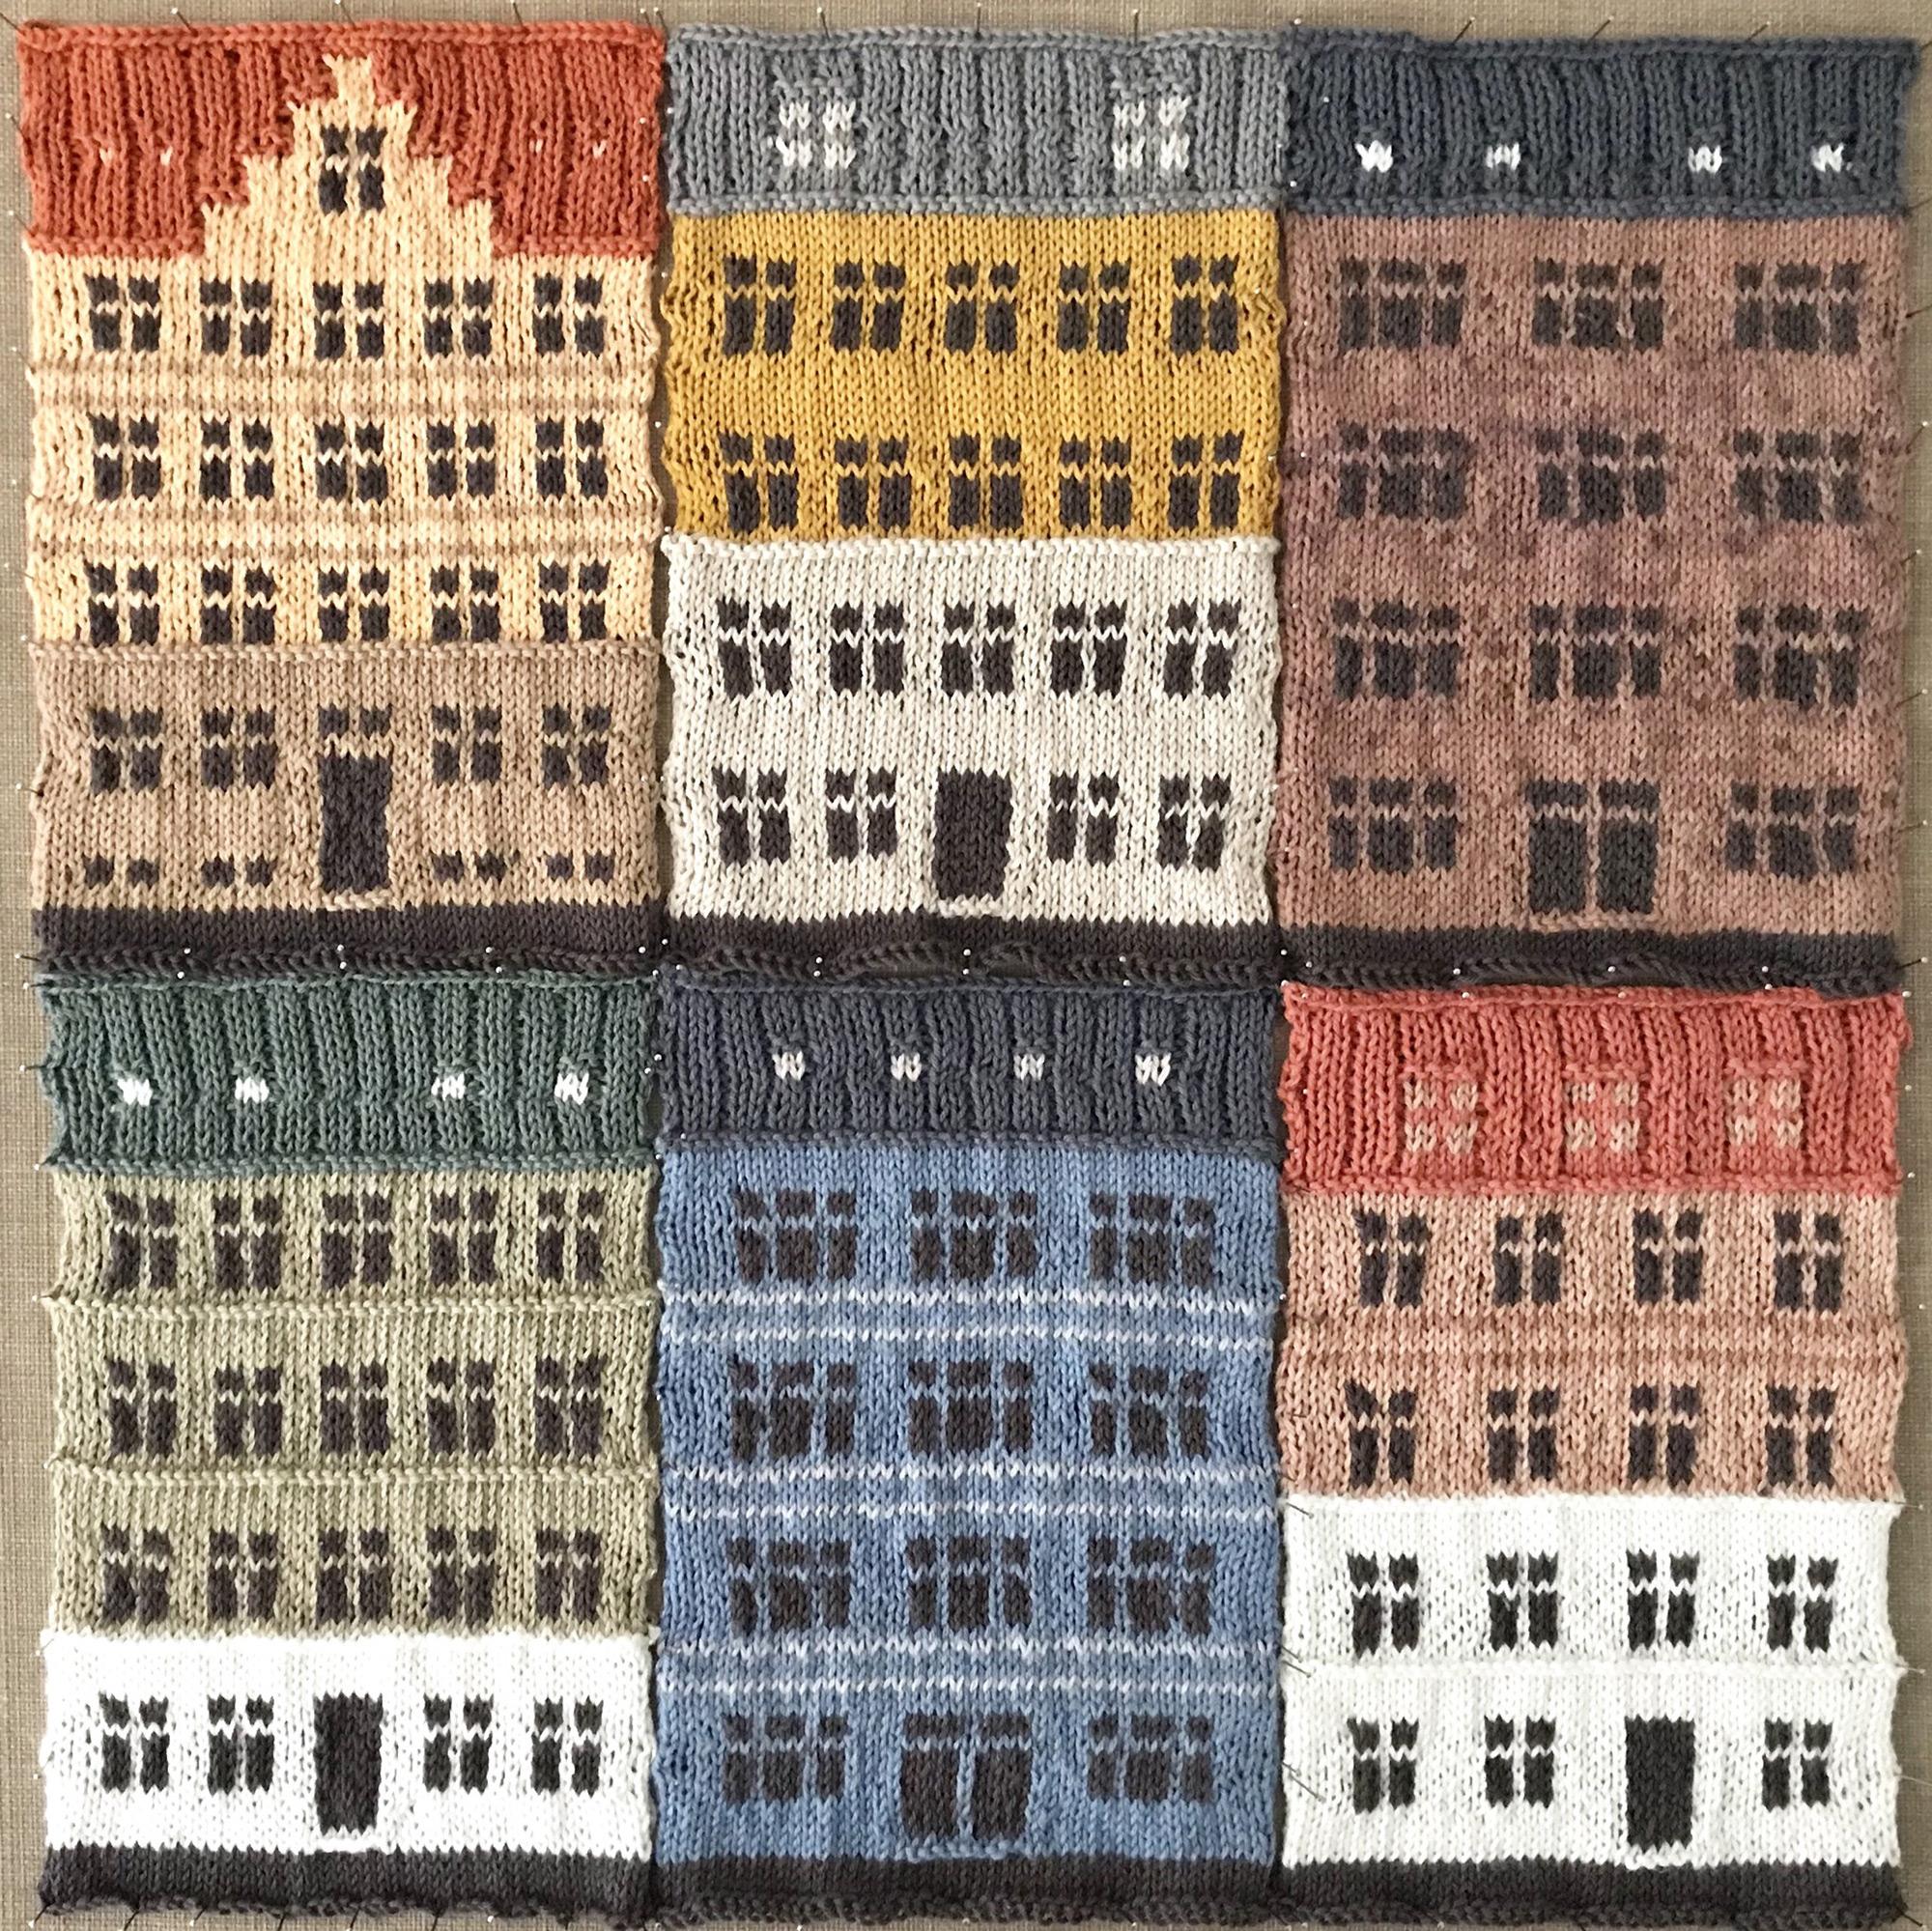 Copenhagen's Distinct Architecture Knit into Color-Blocked Urban Landscapes by Jake Henzler